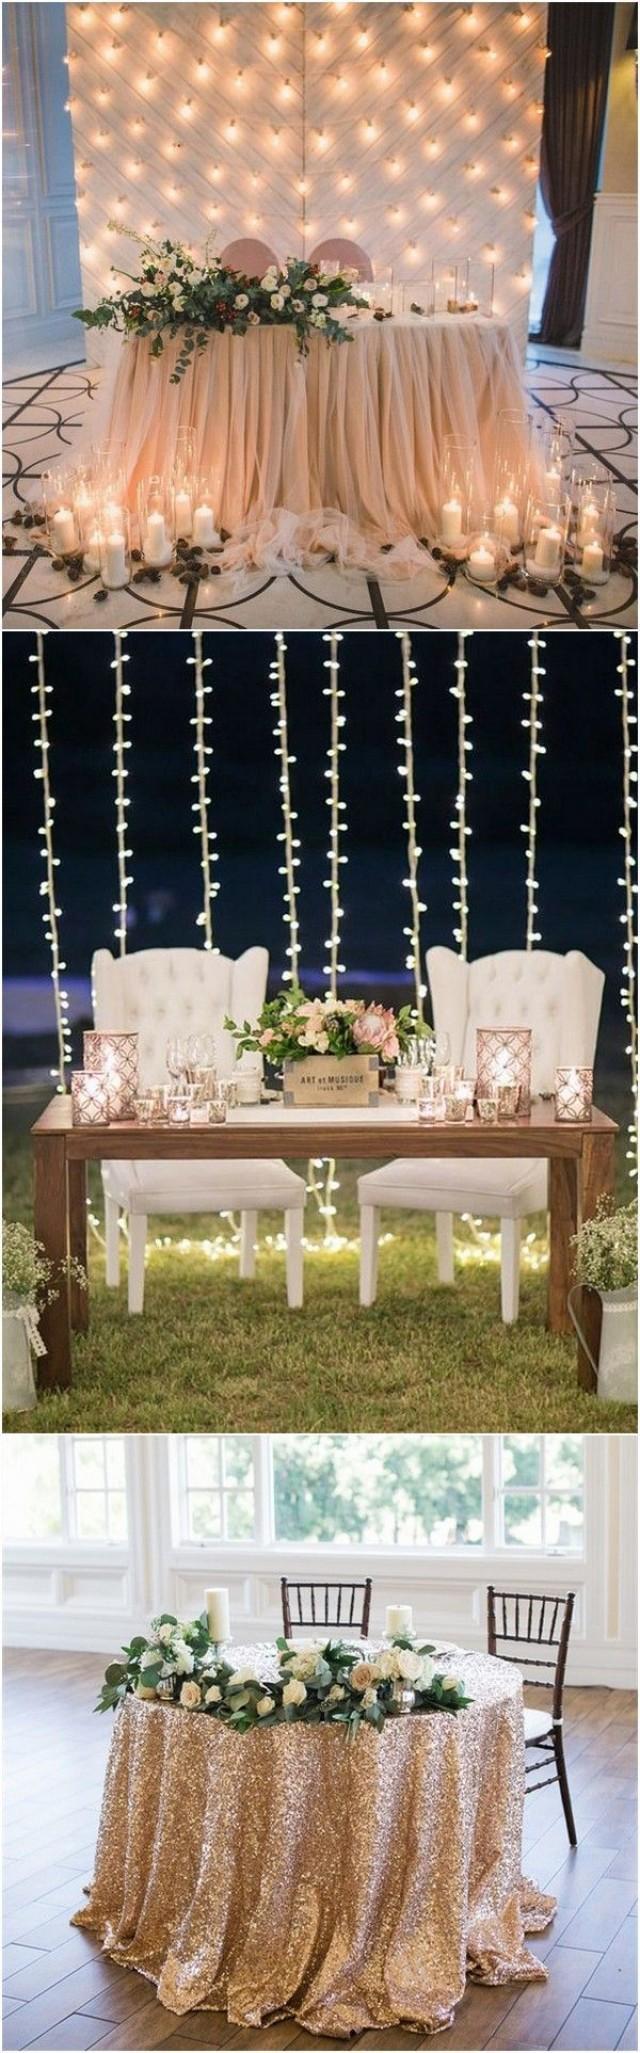 15 romantic wedding sweetheart table decoration ideas 2762968 weddbook